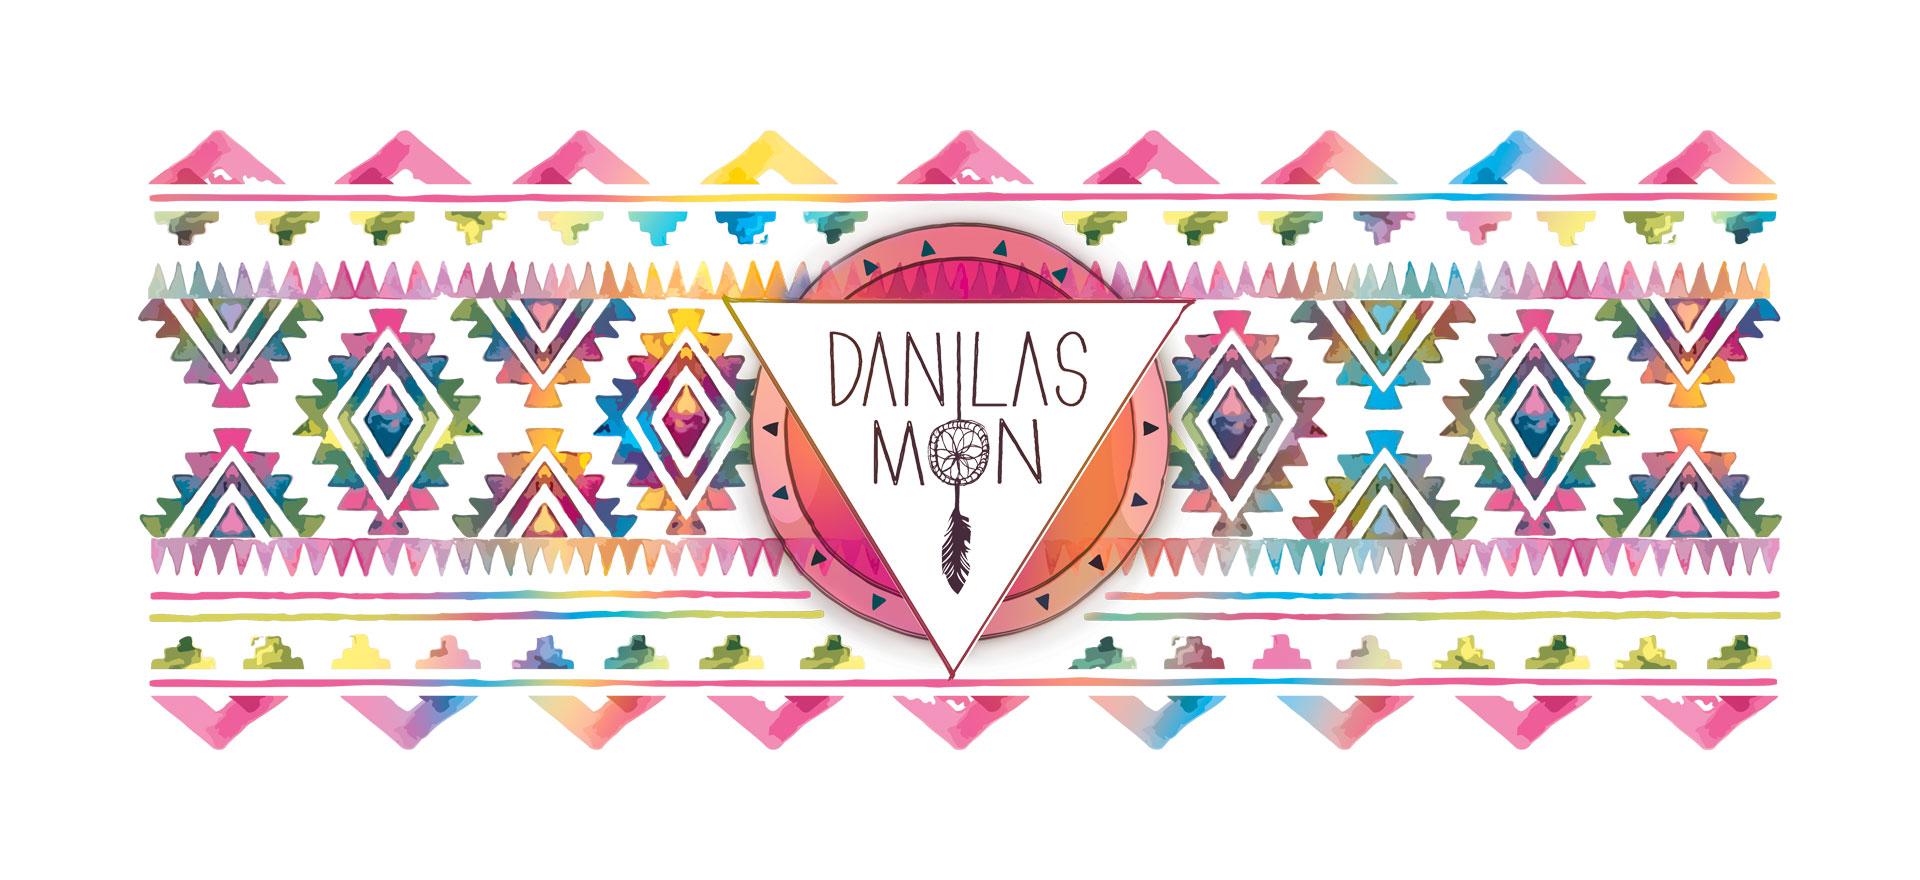 DANILASMON.COM